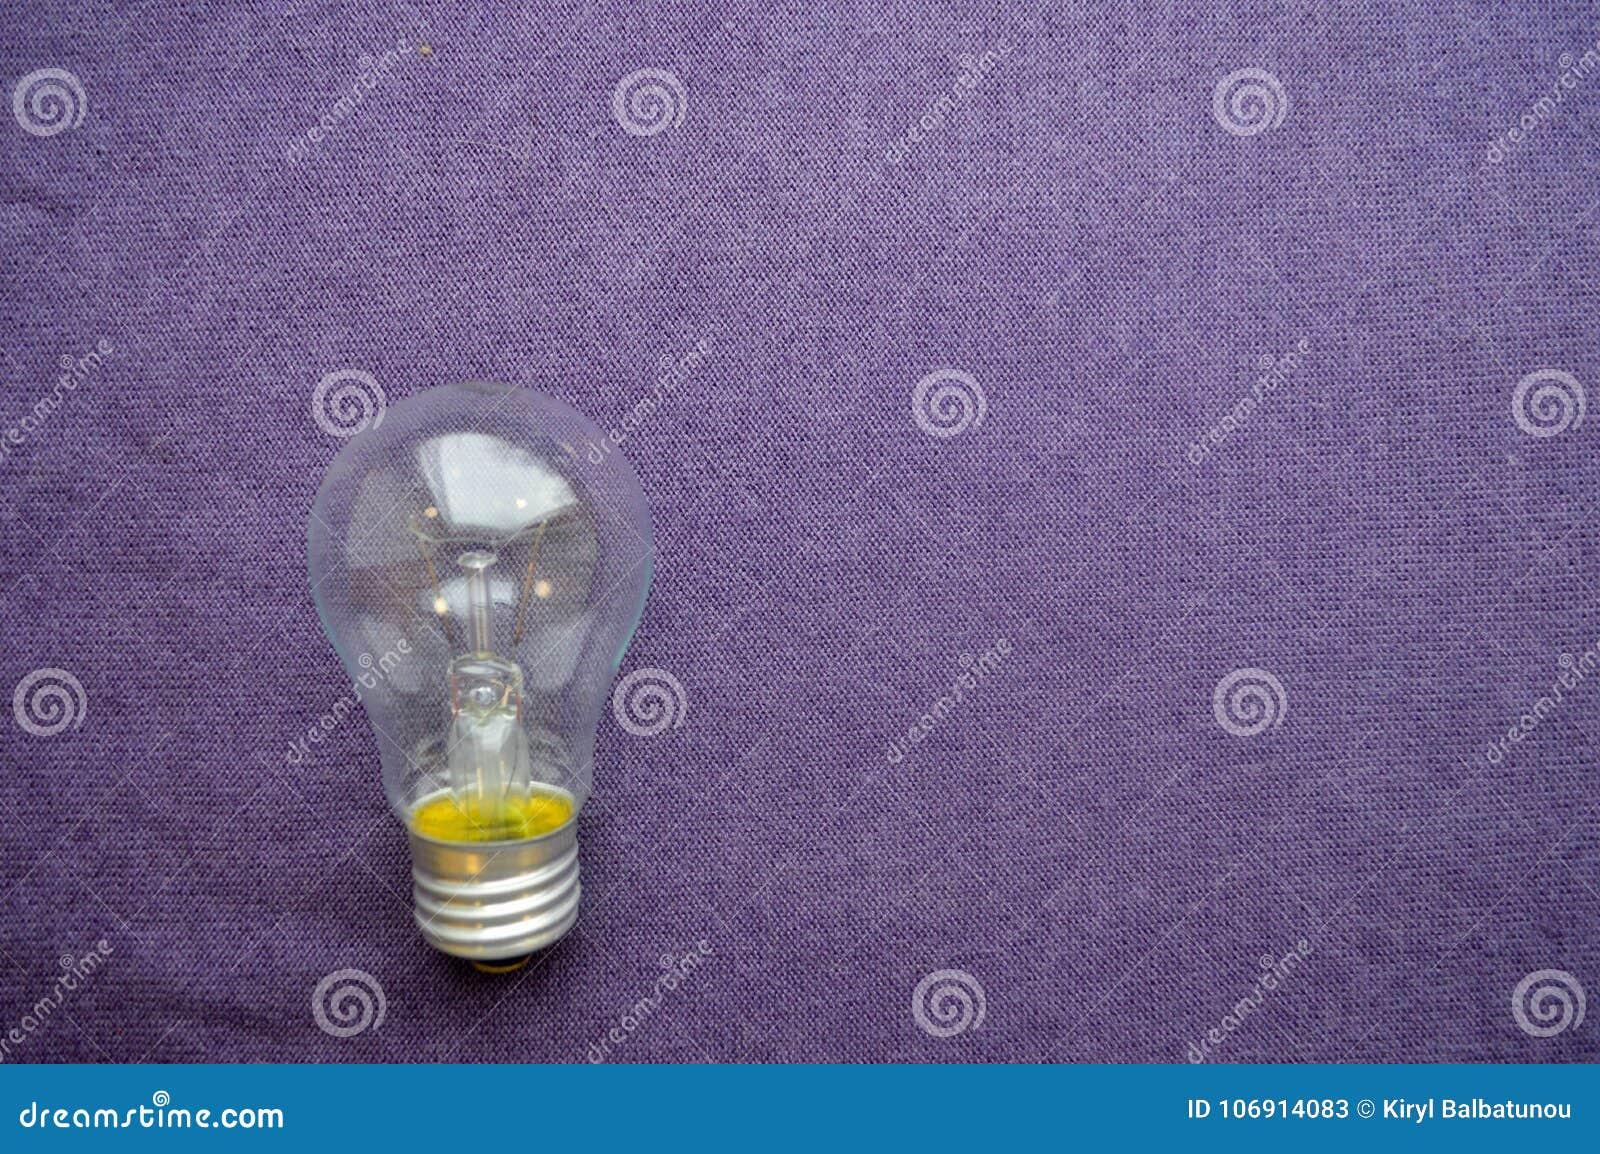 A round, ordinary, non-economical incandescent bulb